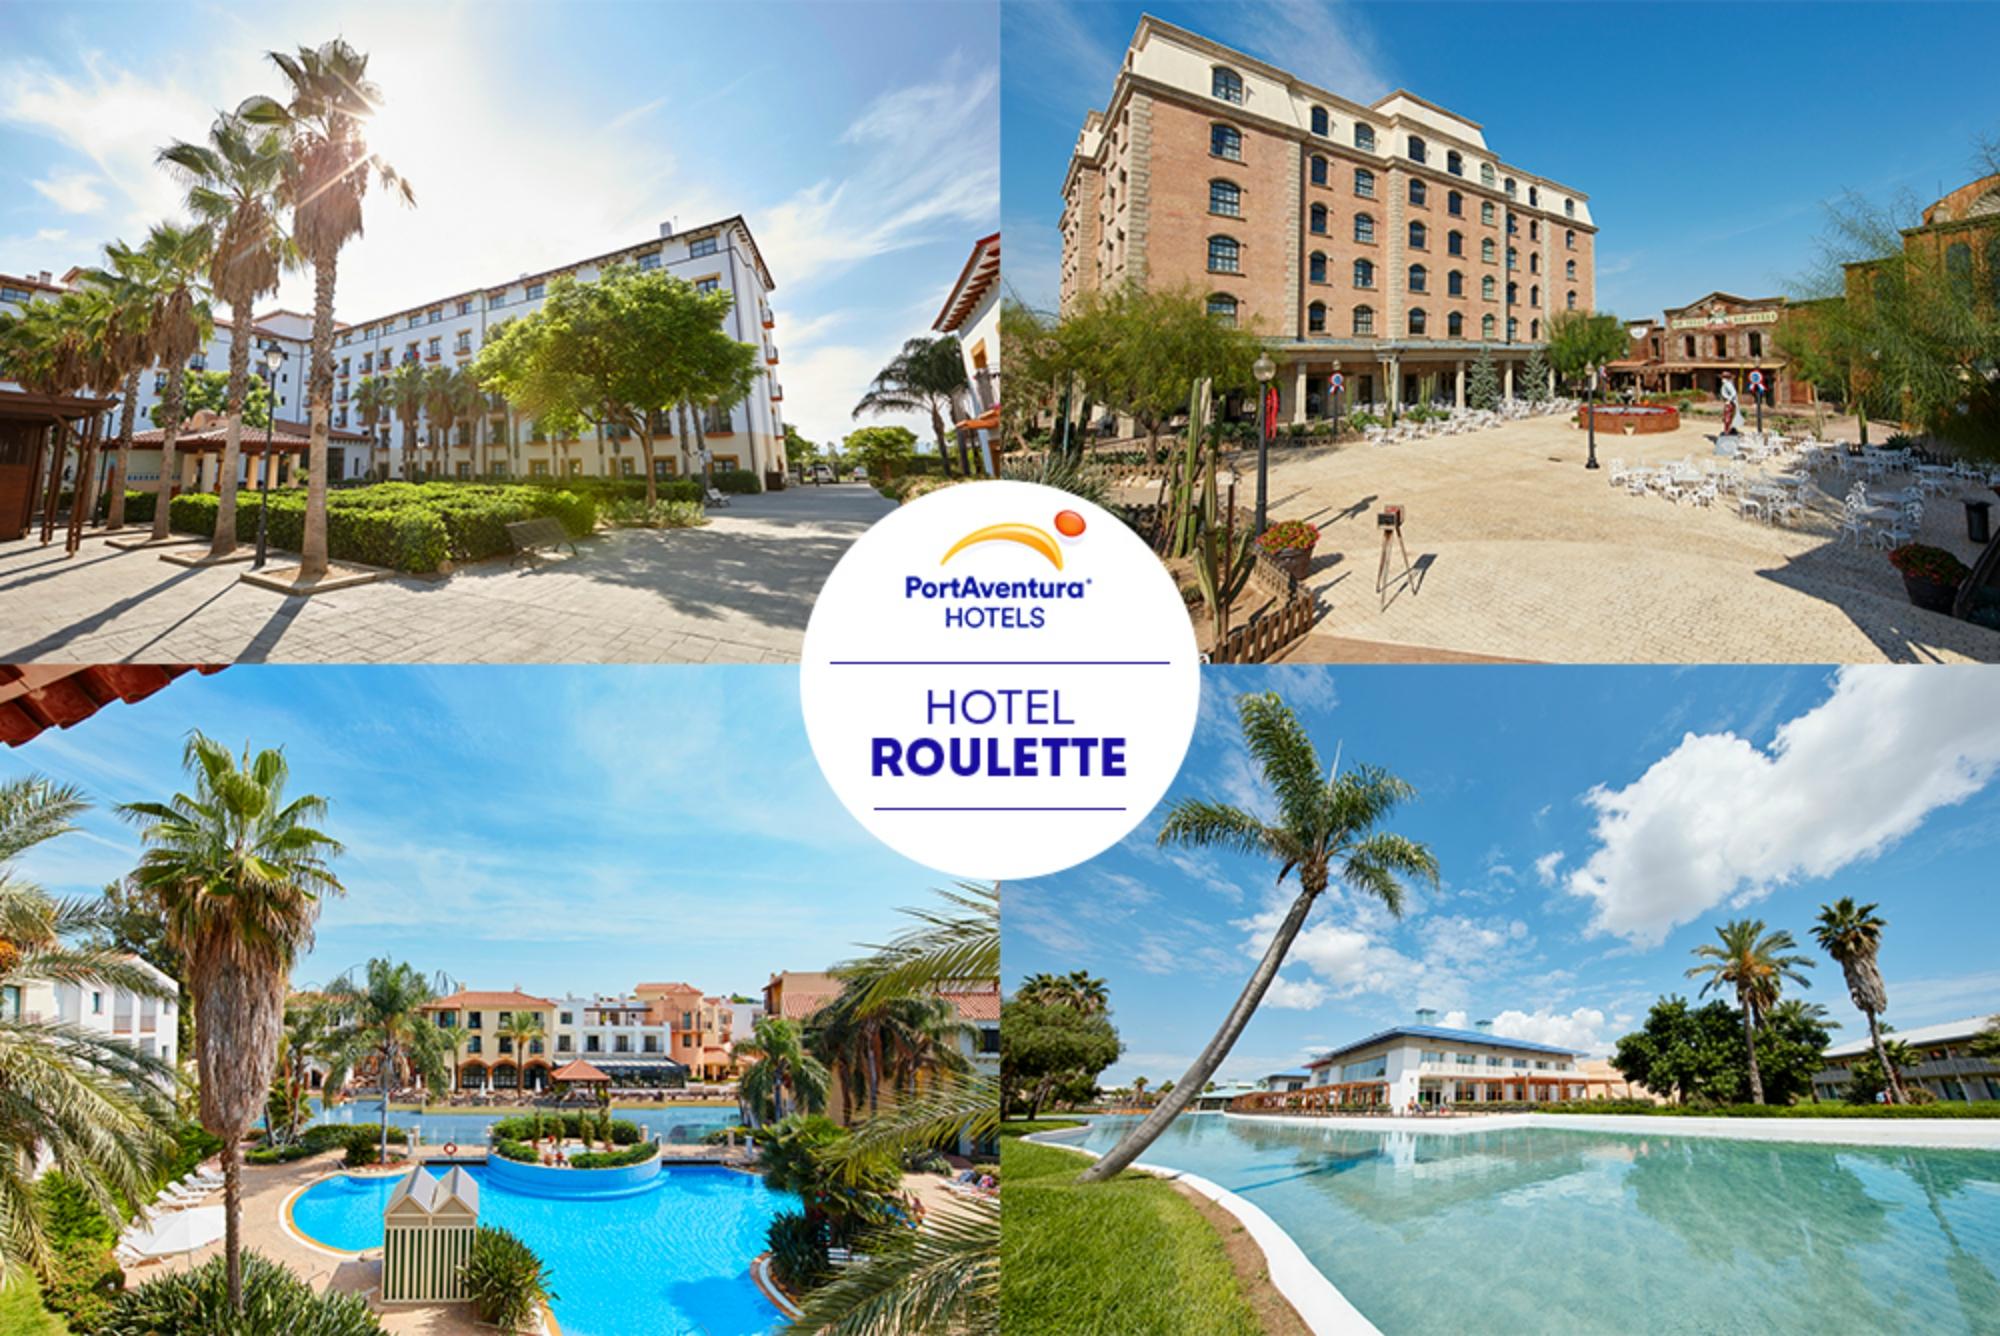 Ruleta portaventura resort hotel en salou viajes el - Hotel roulette port aventura ...